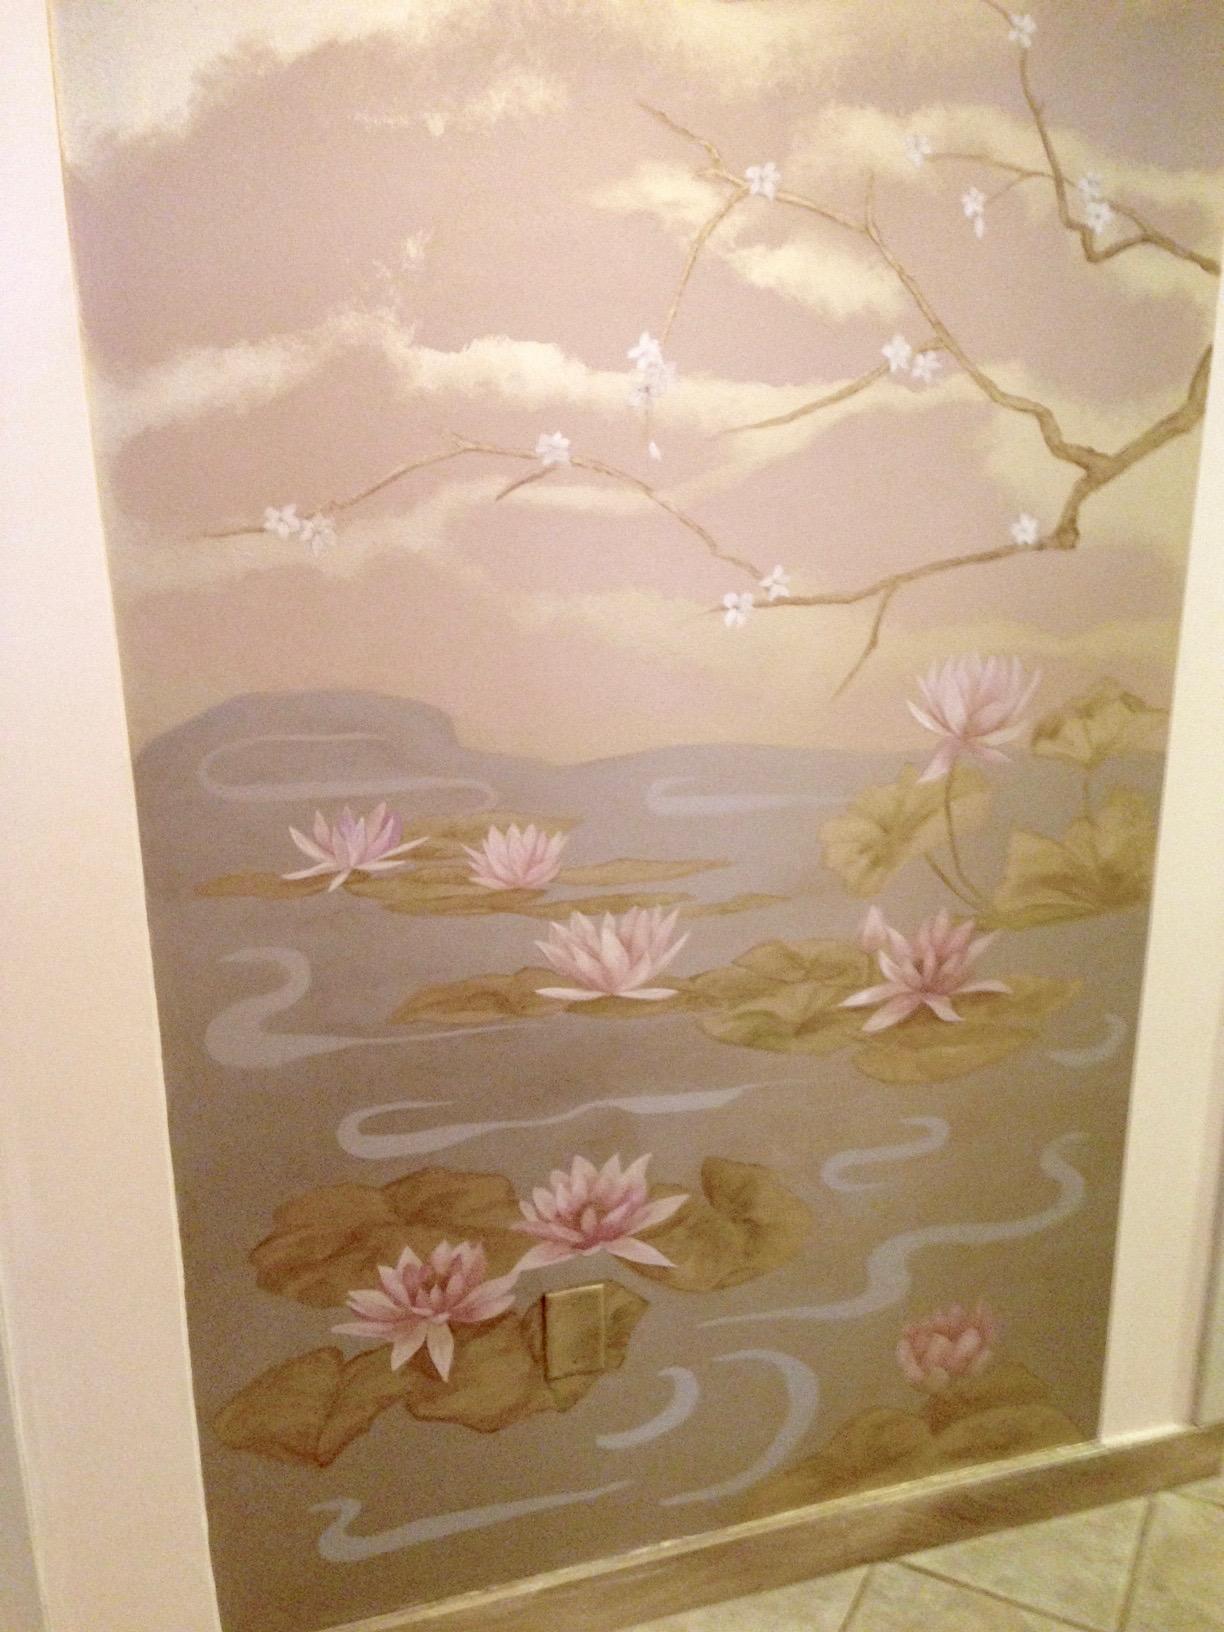 Shambala Spa Japaneese mural - details